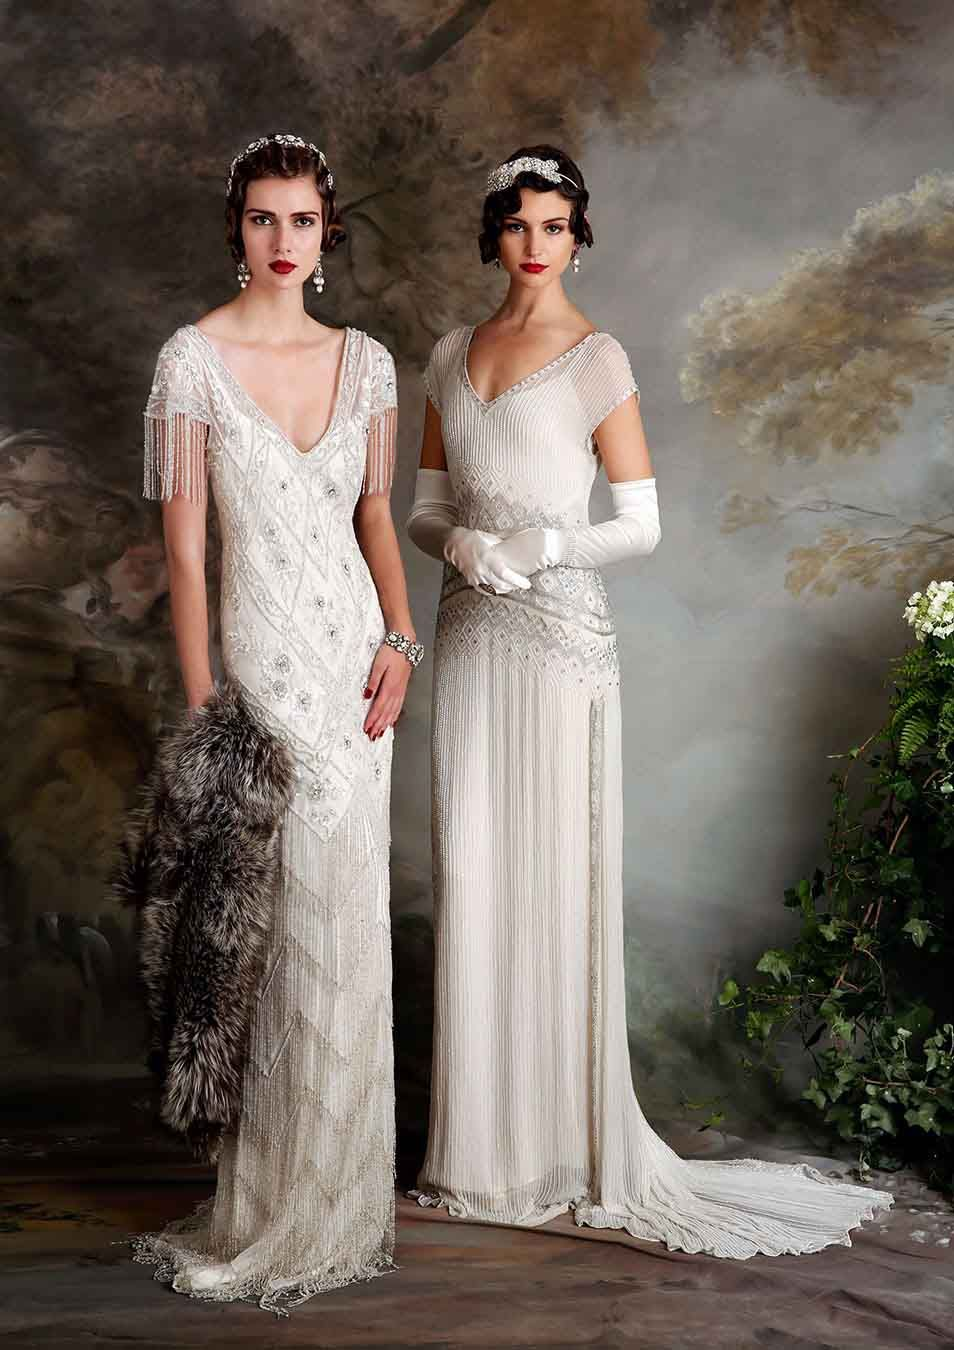 10 Vintage Inspired Wedding Dresses for Timeless elegance